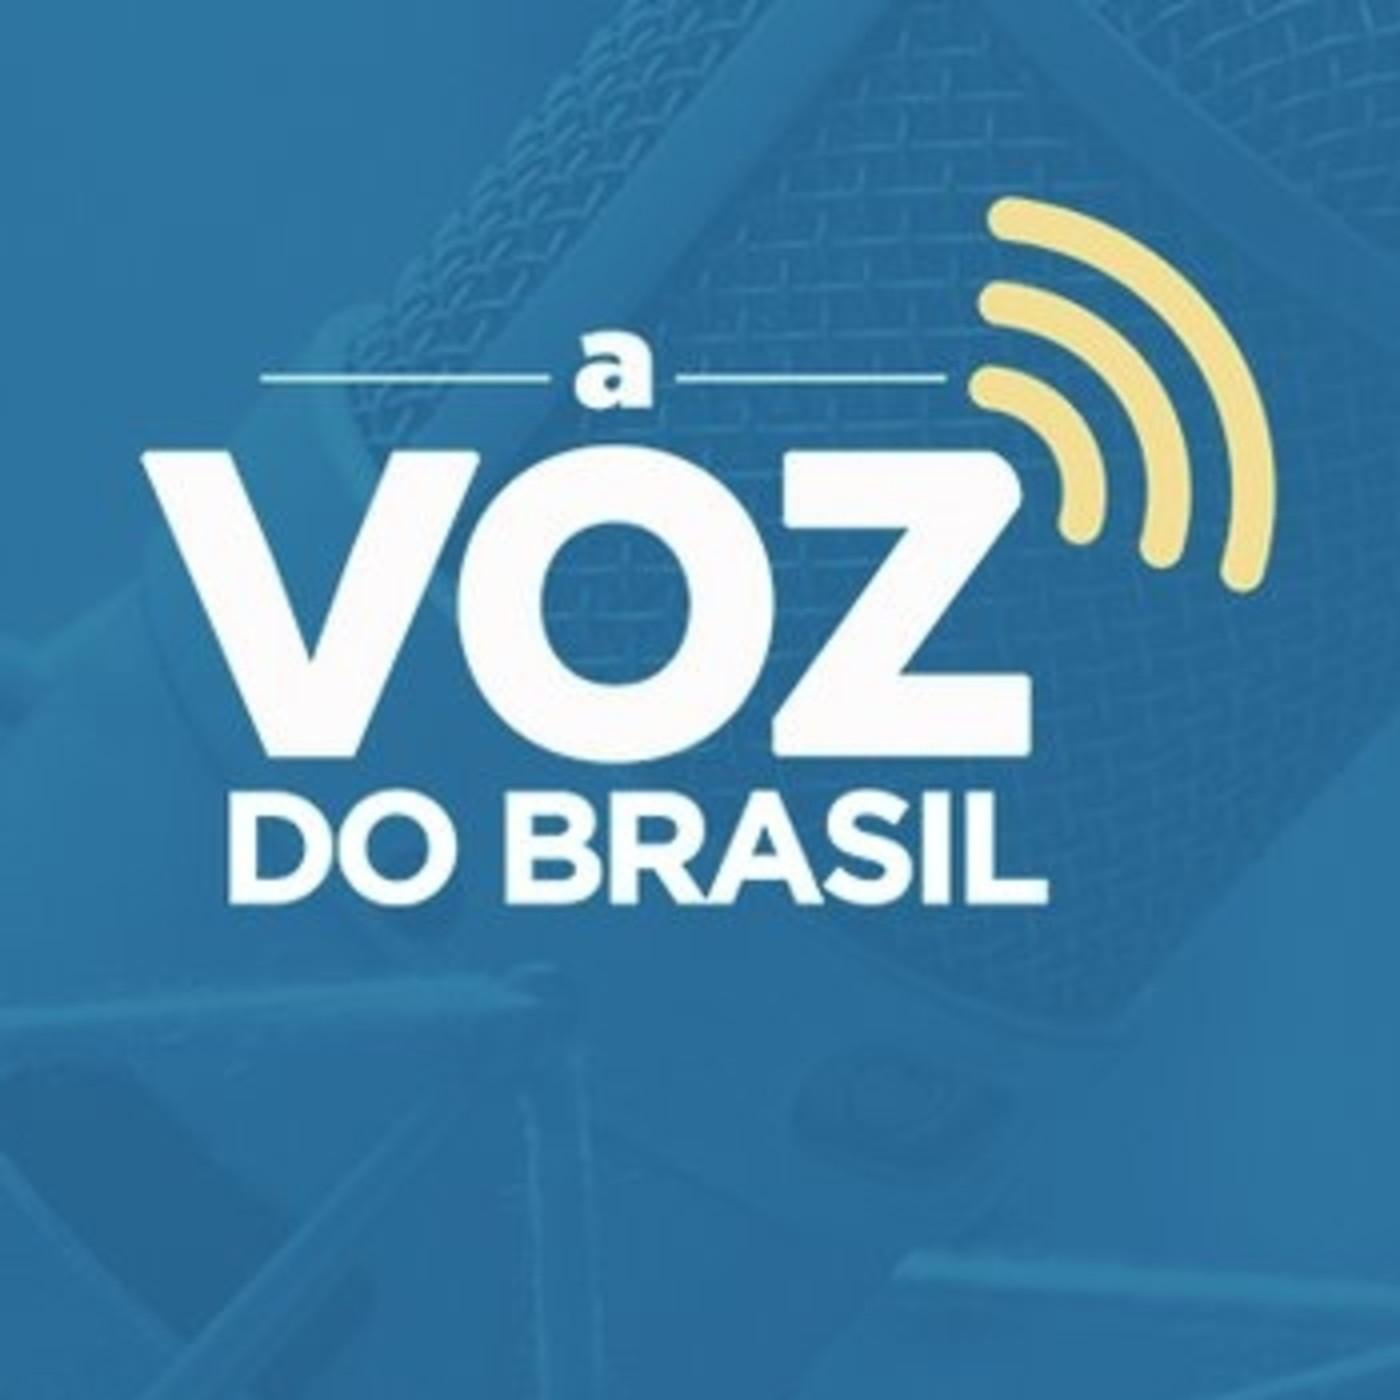 A Voz do Brasil 2019-04-23